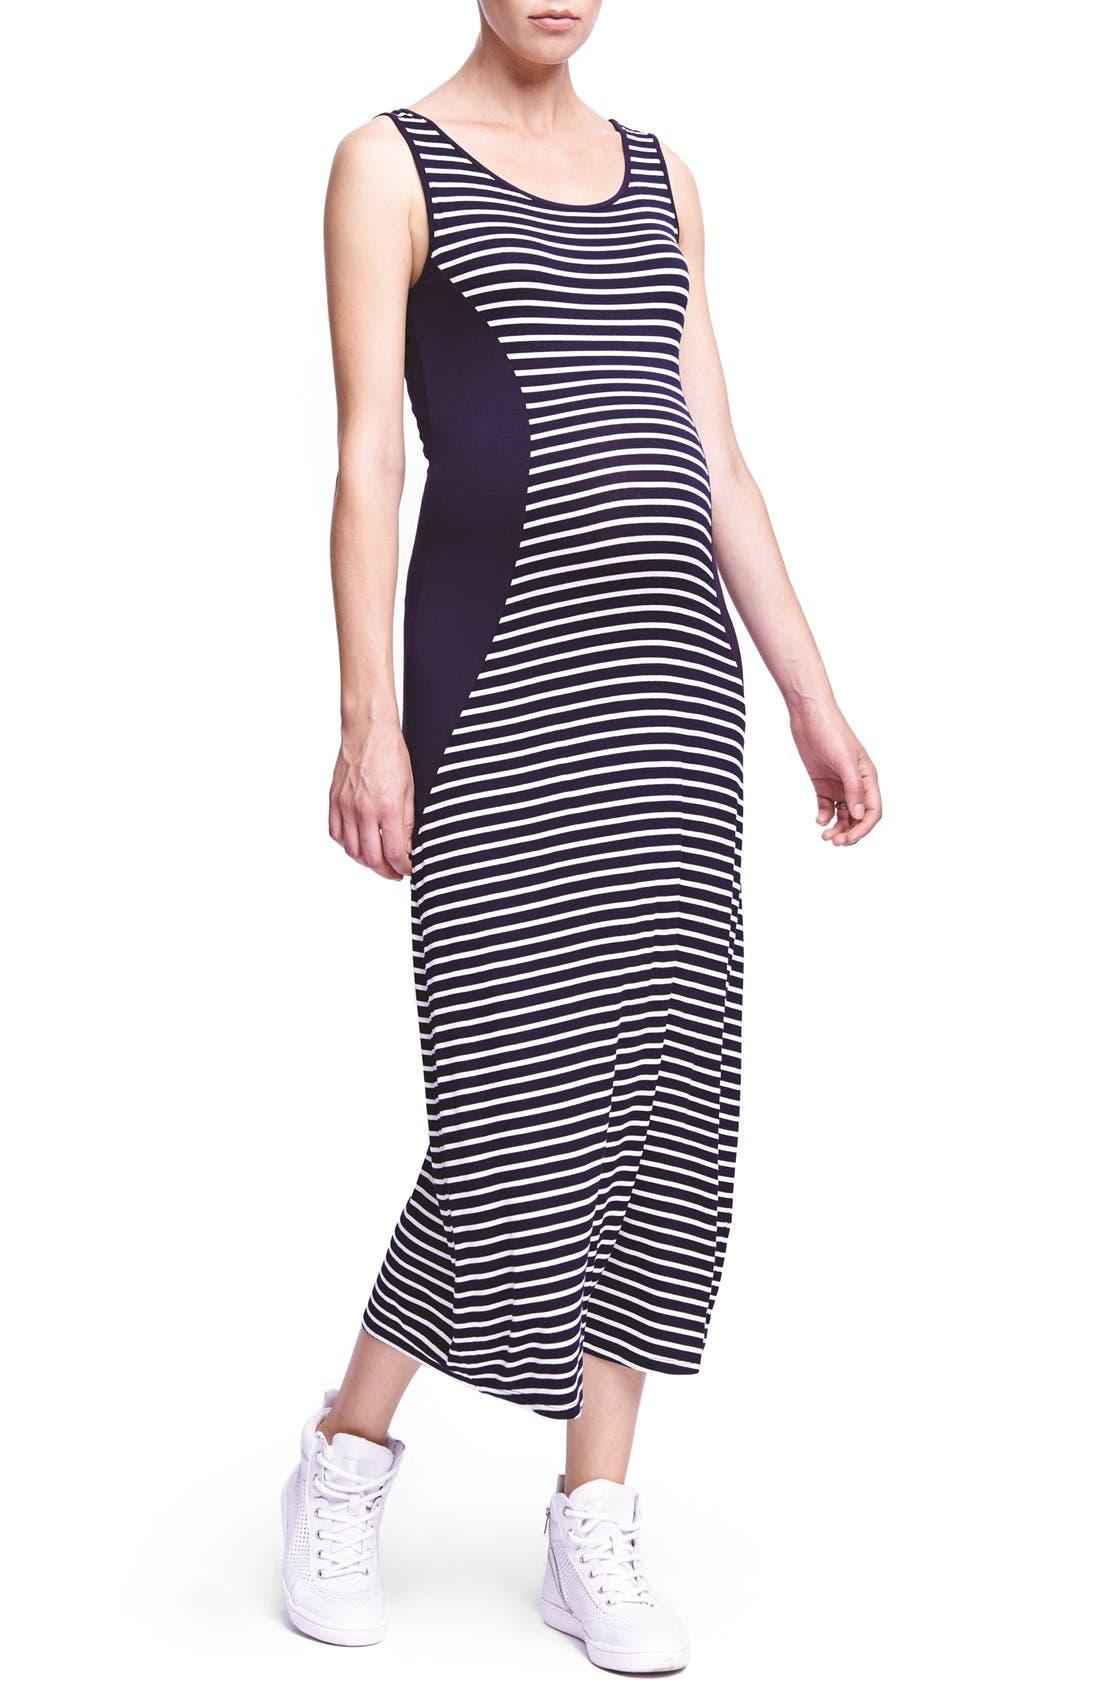 The Urban Ma Scoop Neck Maxi Lightweight Maternity Dress